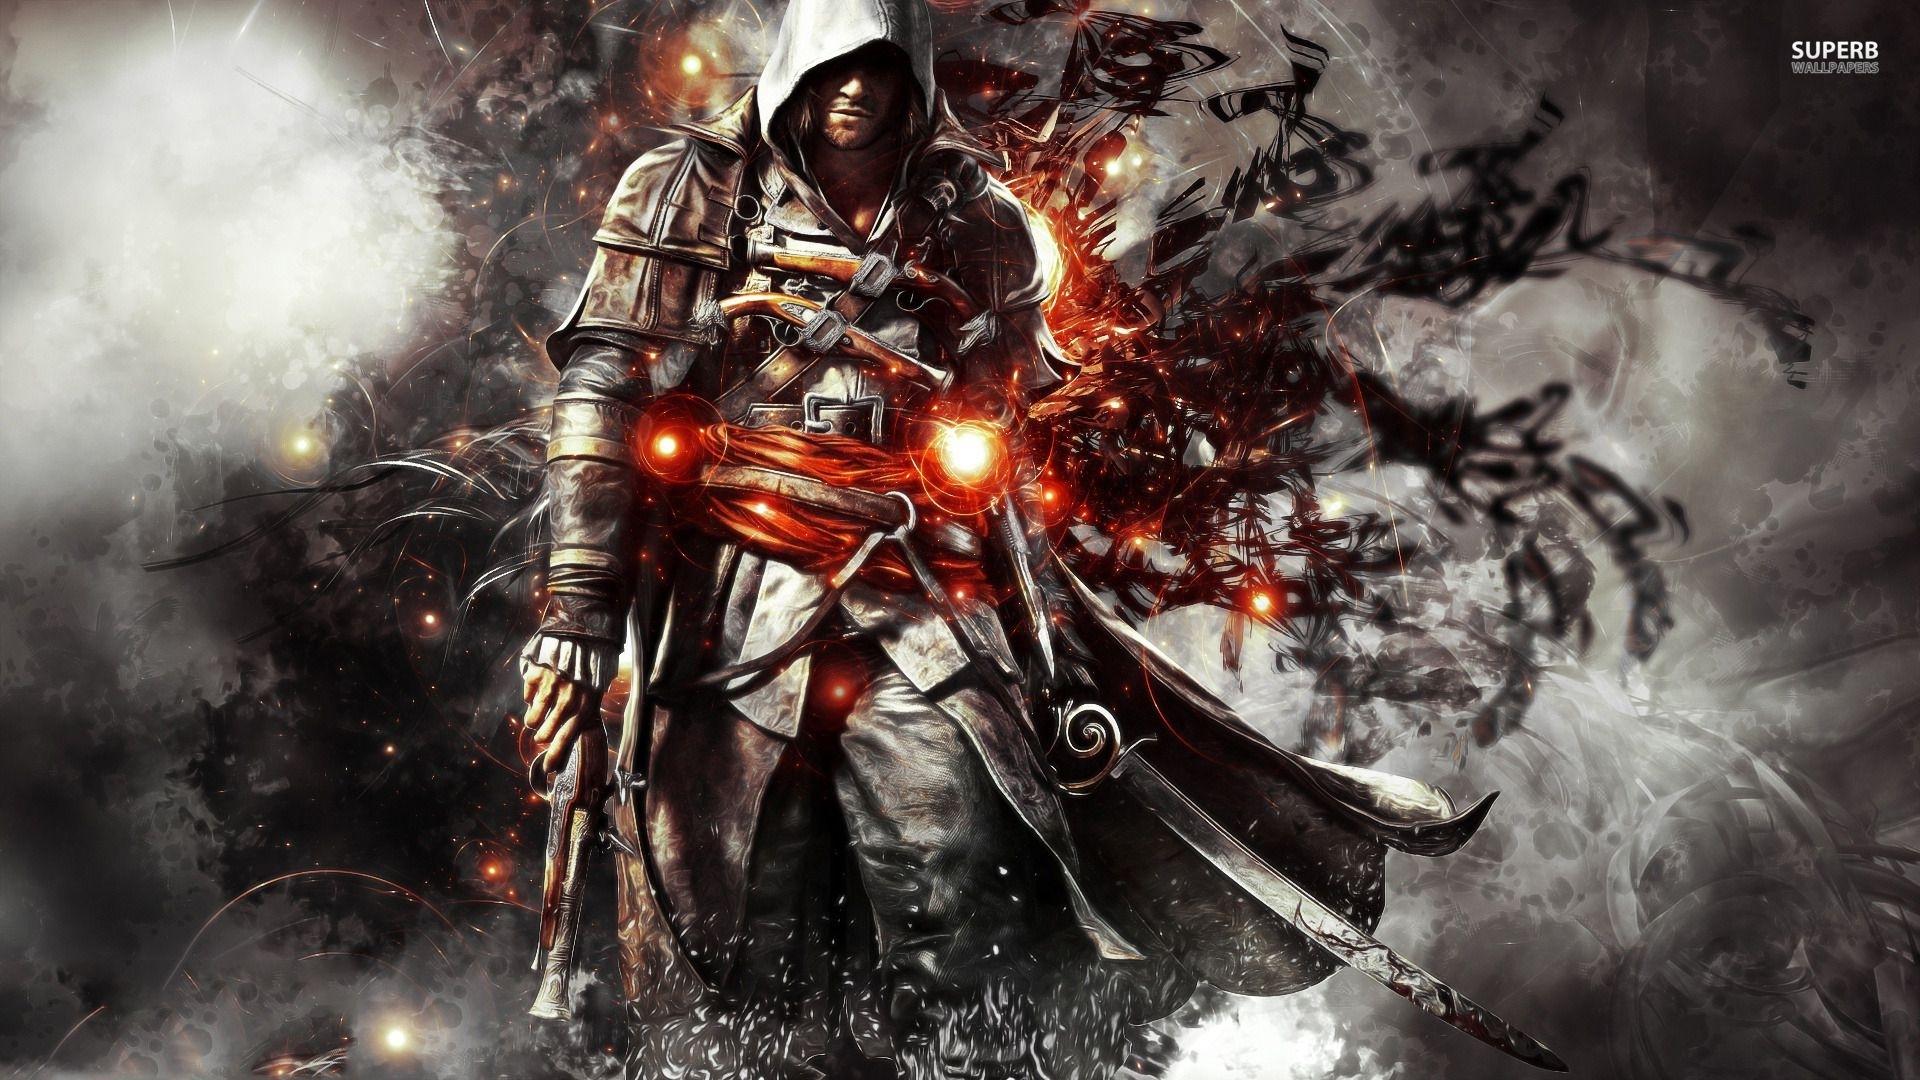 assassin's creed wallpaper - bdfjade